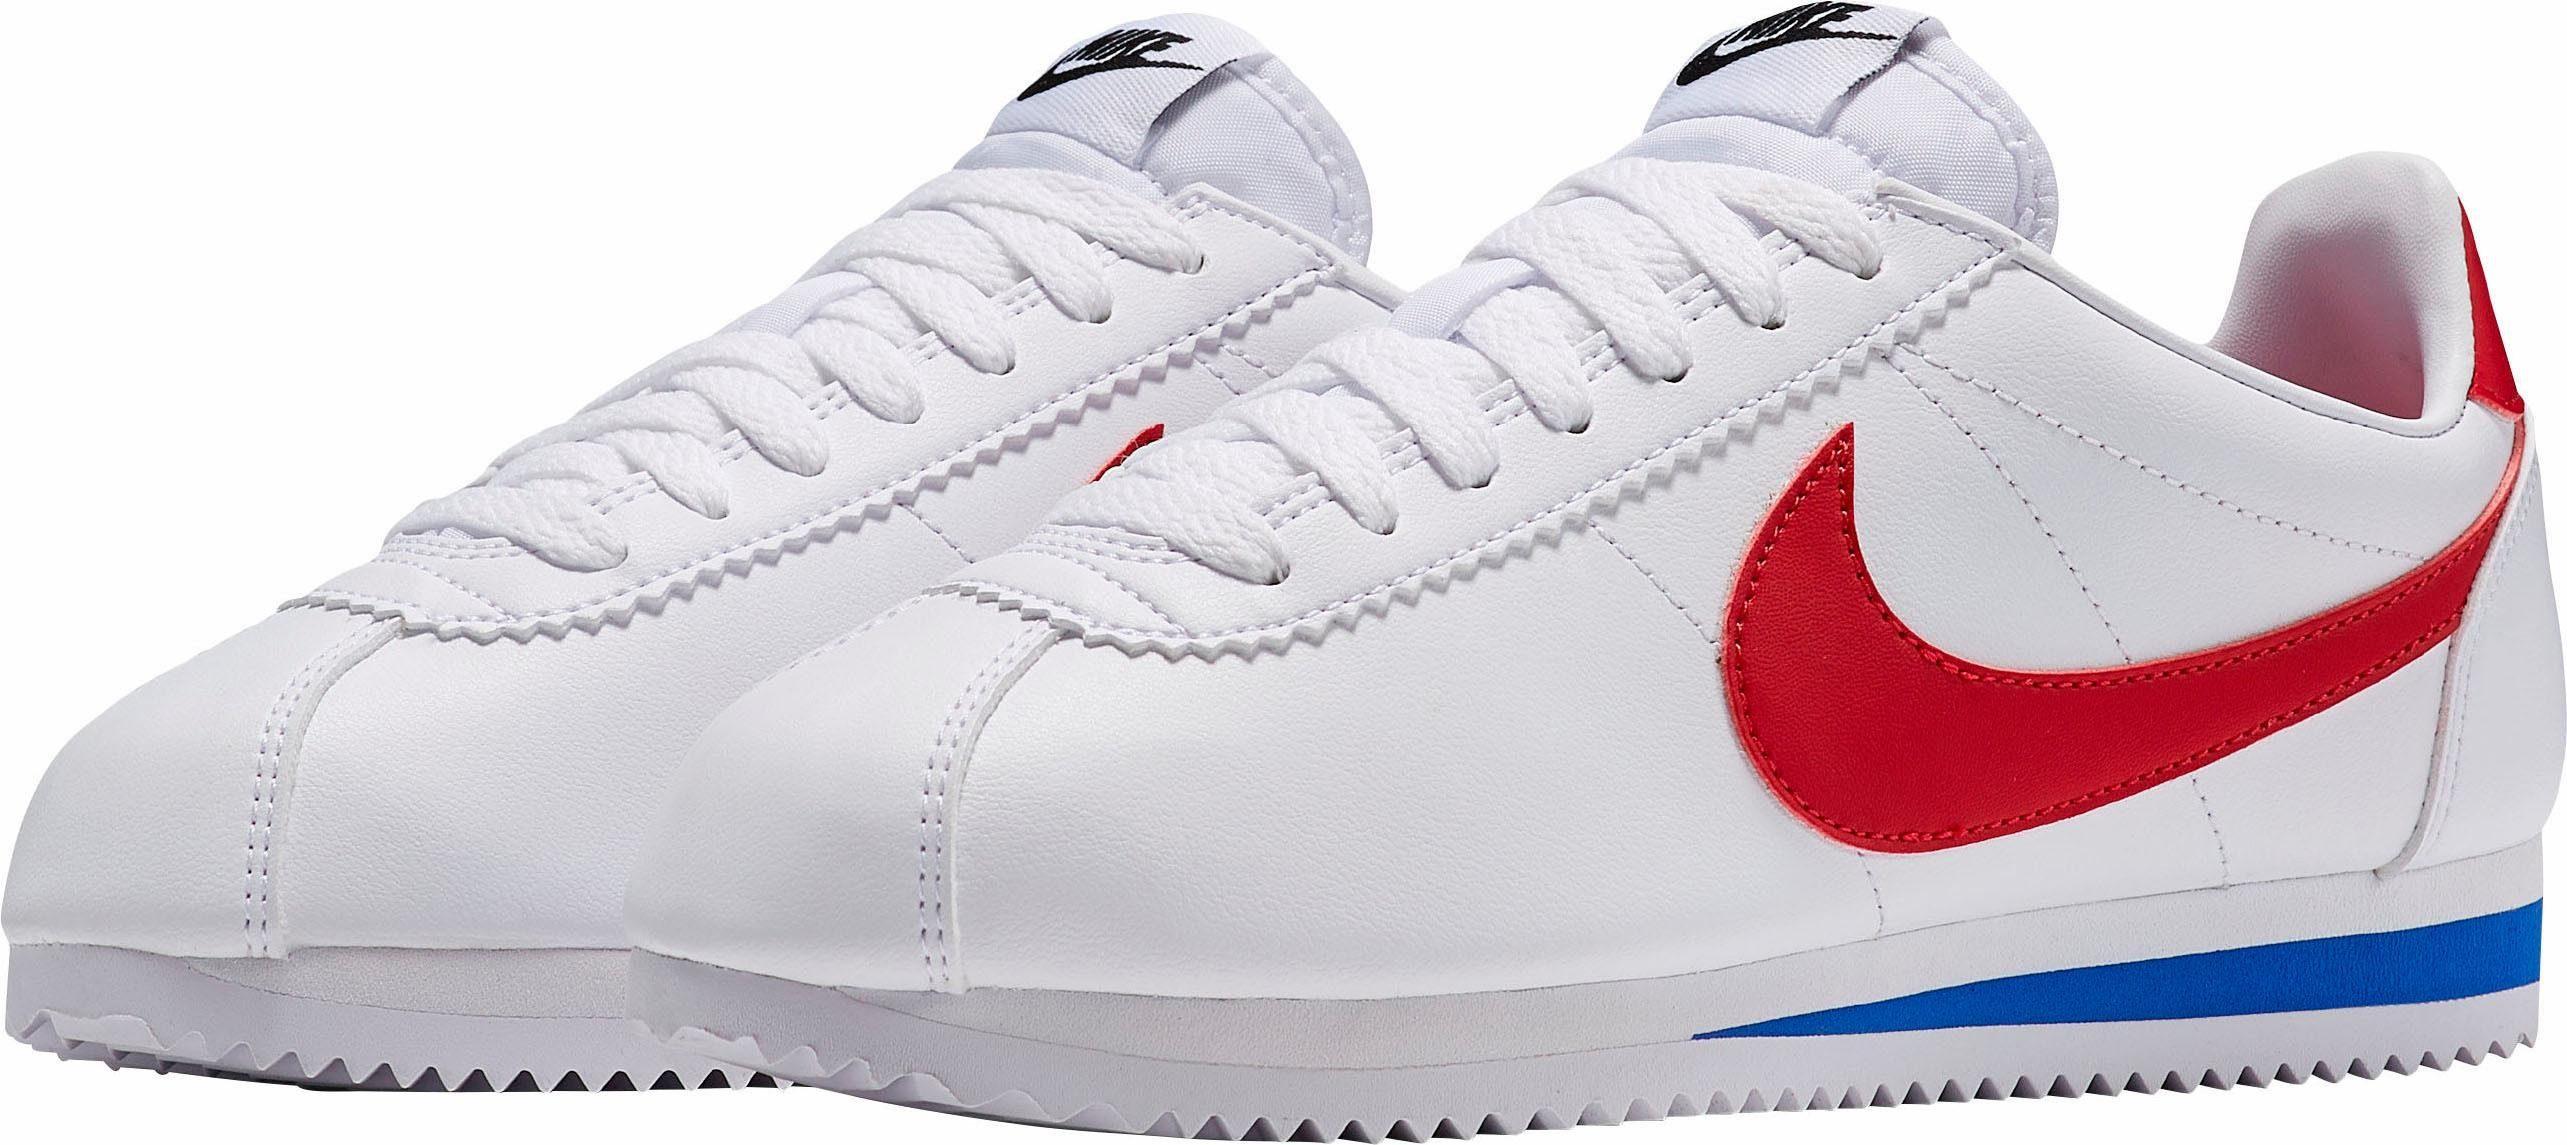 Nike Sportswear »Wmns Classic Cortez Leather« Sneaker, Obermaterial aus  Leder online kaufen | OTTO